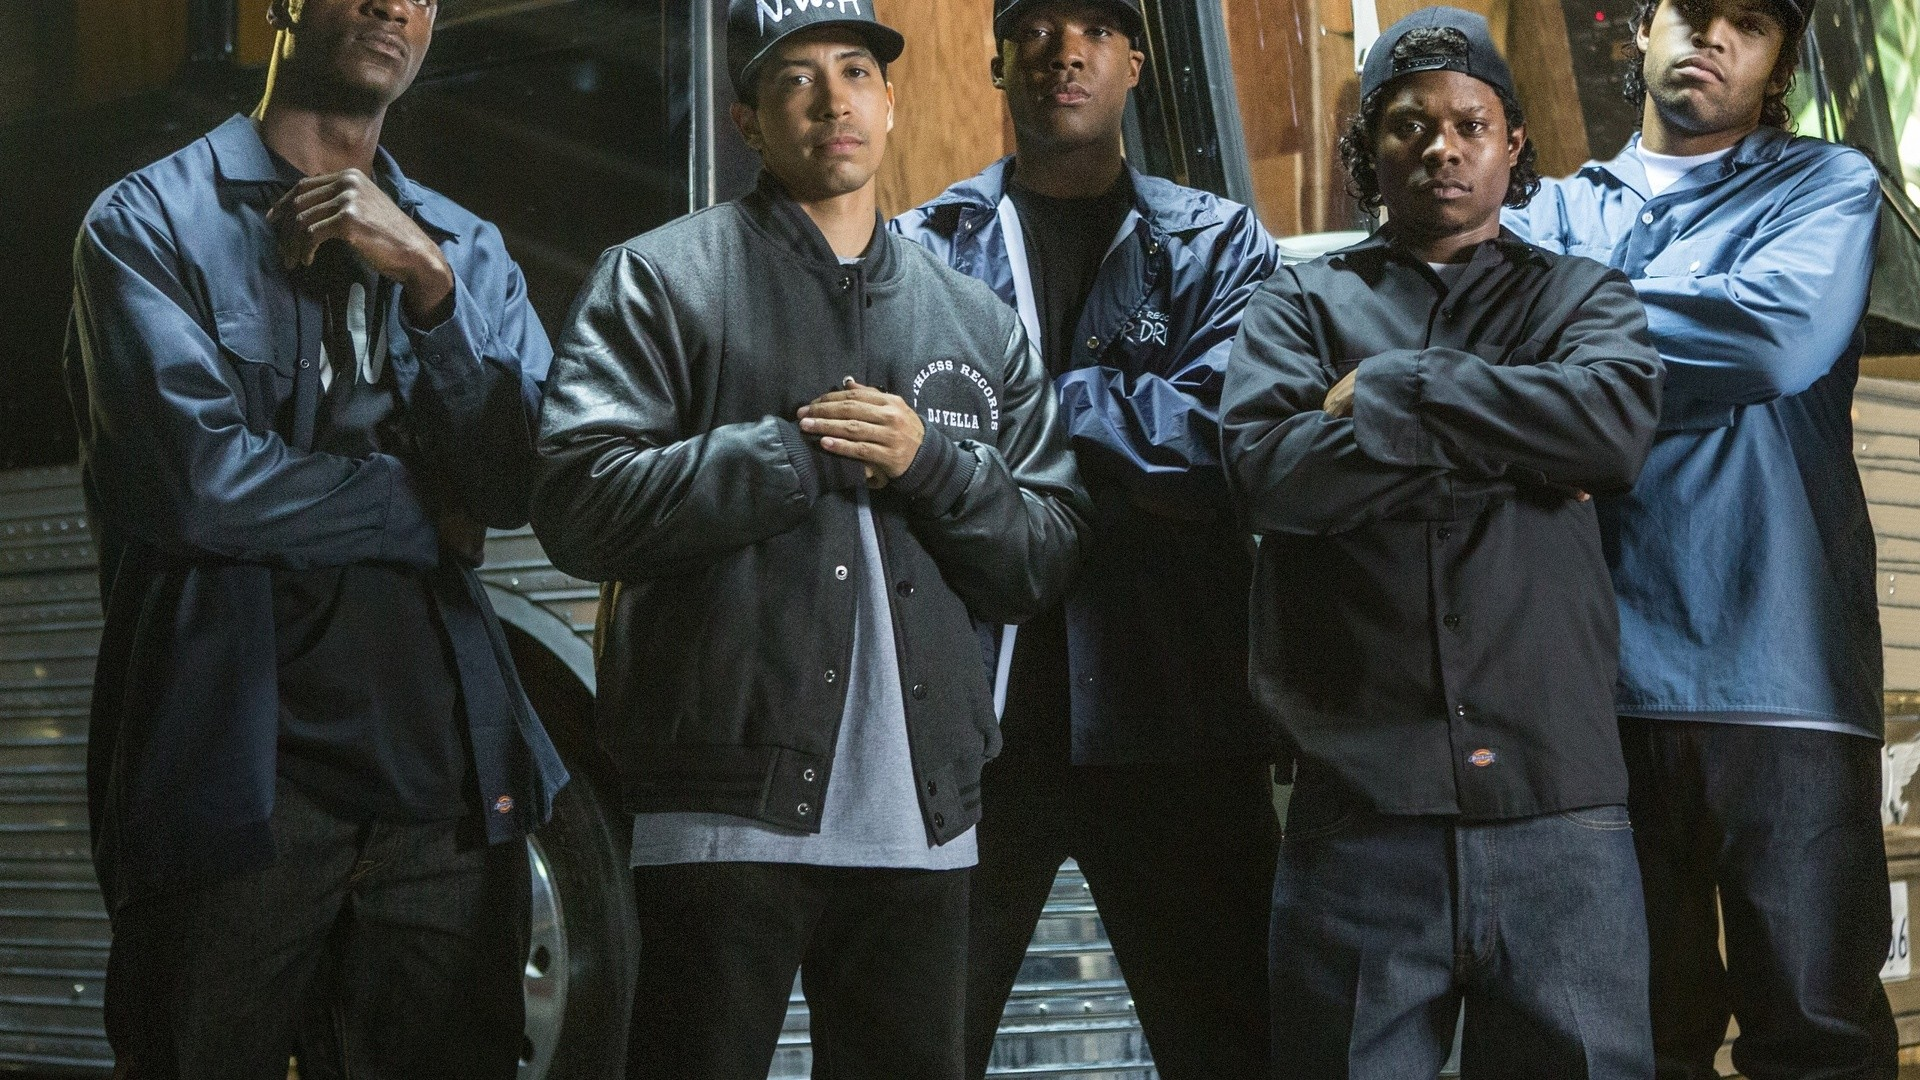 Res: 1920x1080, Straight Outta Compton, Hip Hop, Eazy E, Rapper, Nwa, Rap,